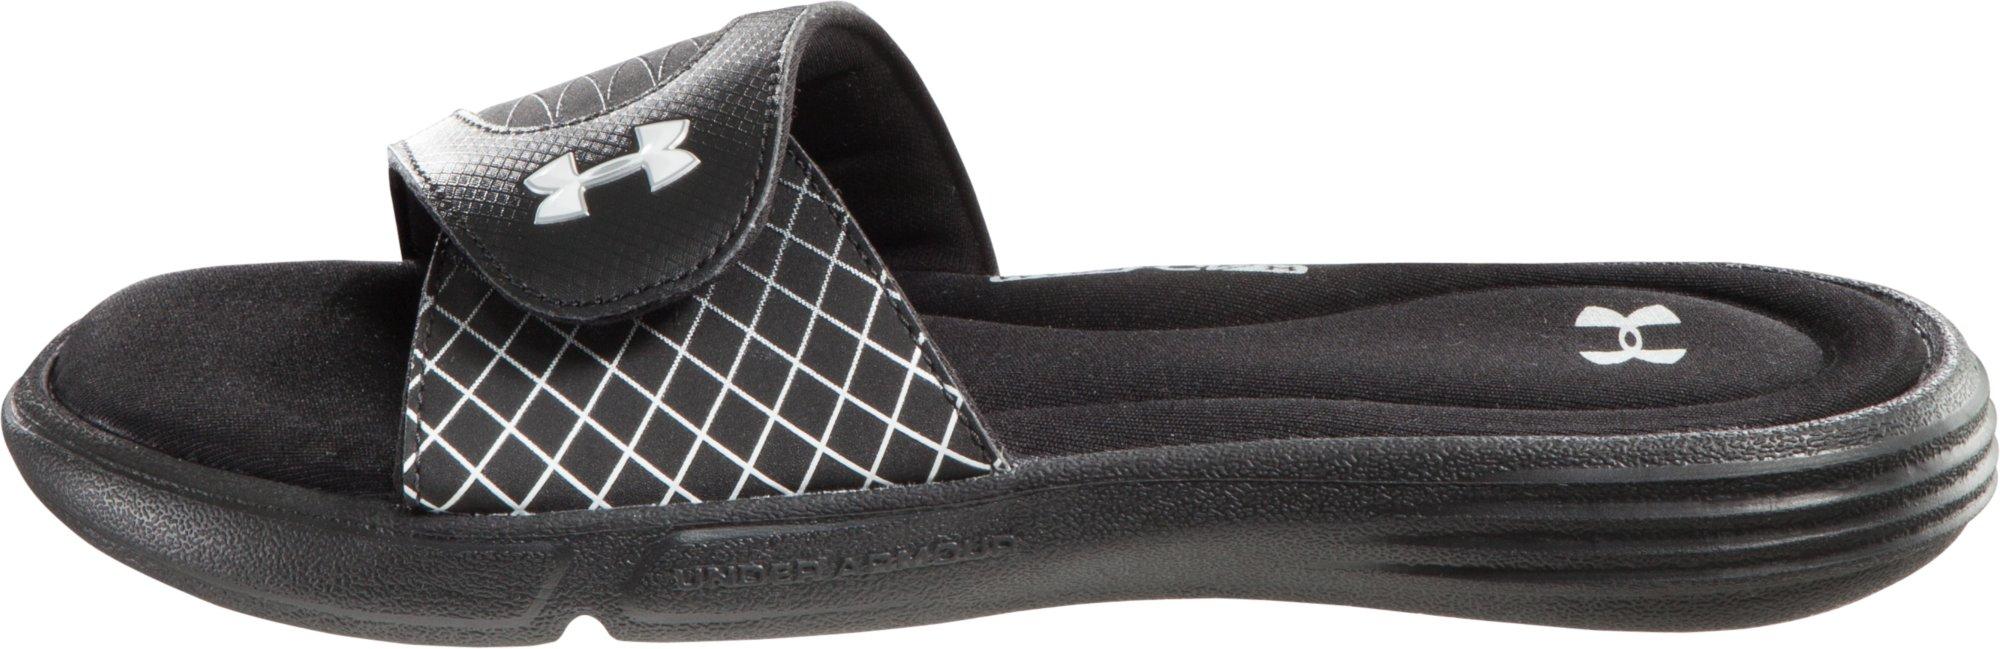 Luxury Under Armour Womens UA Ignite VII SL Sandals  Savechic